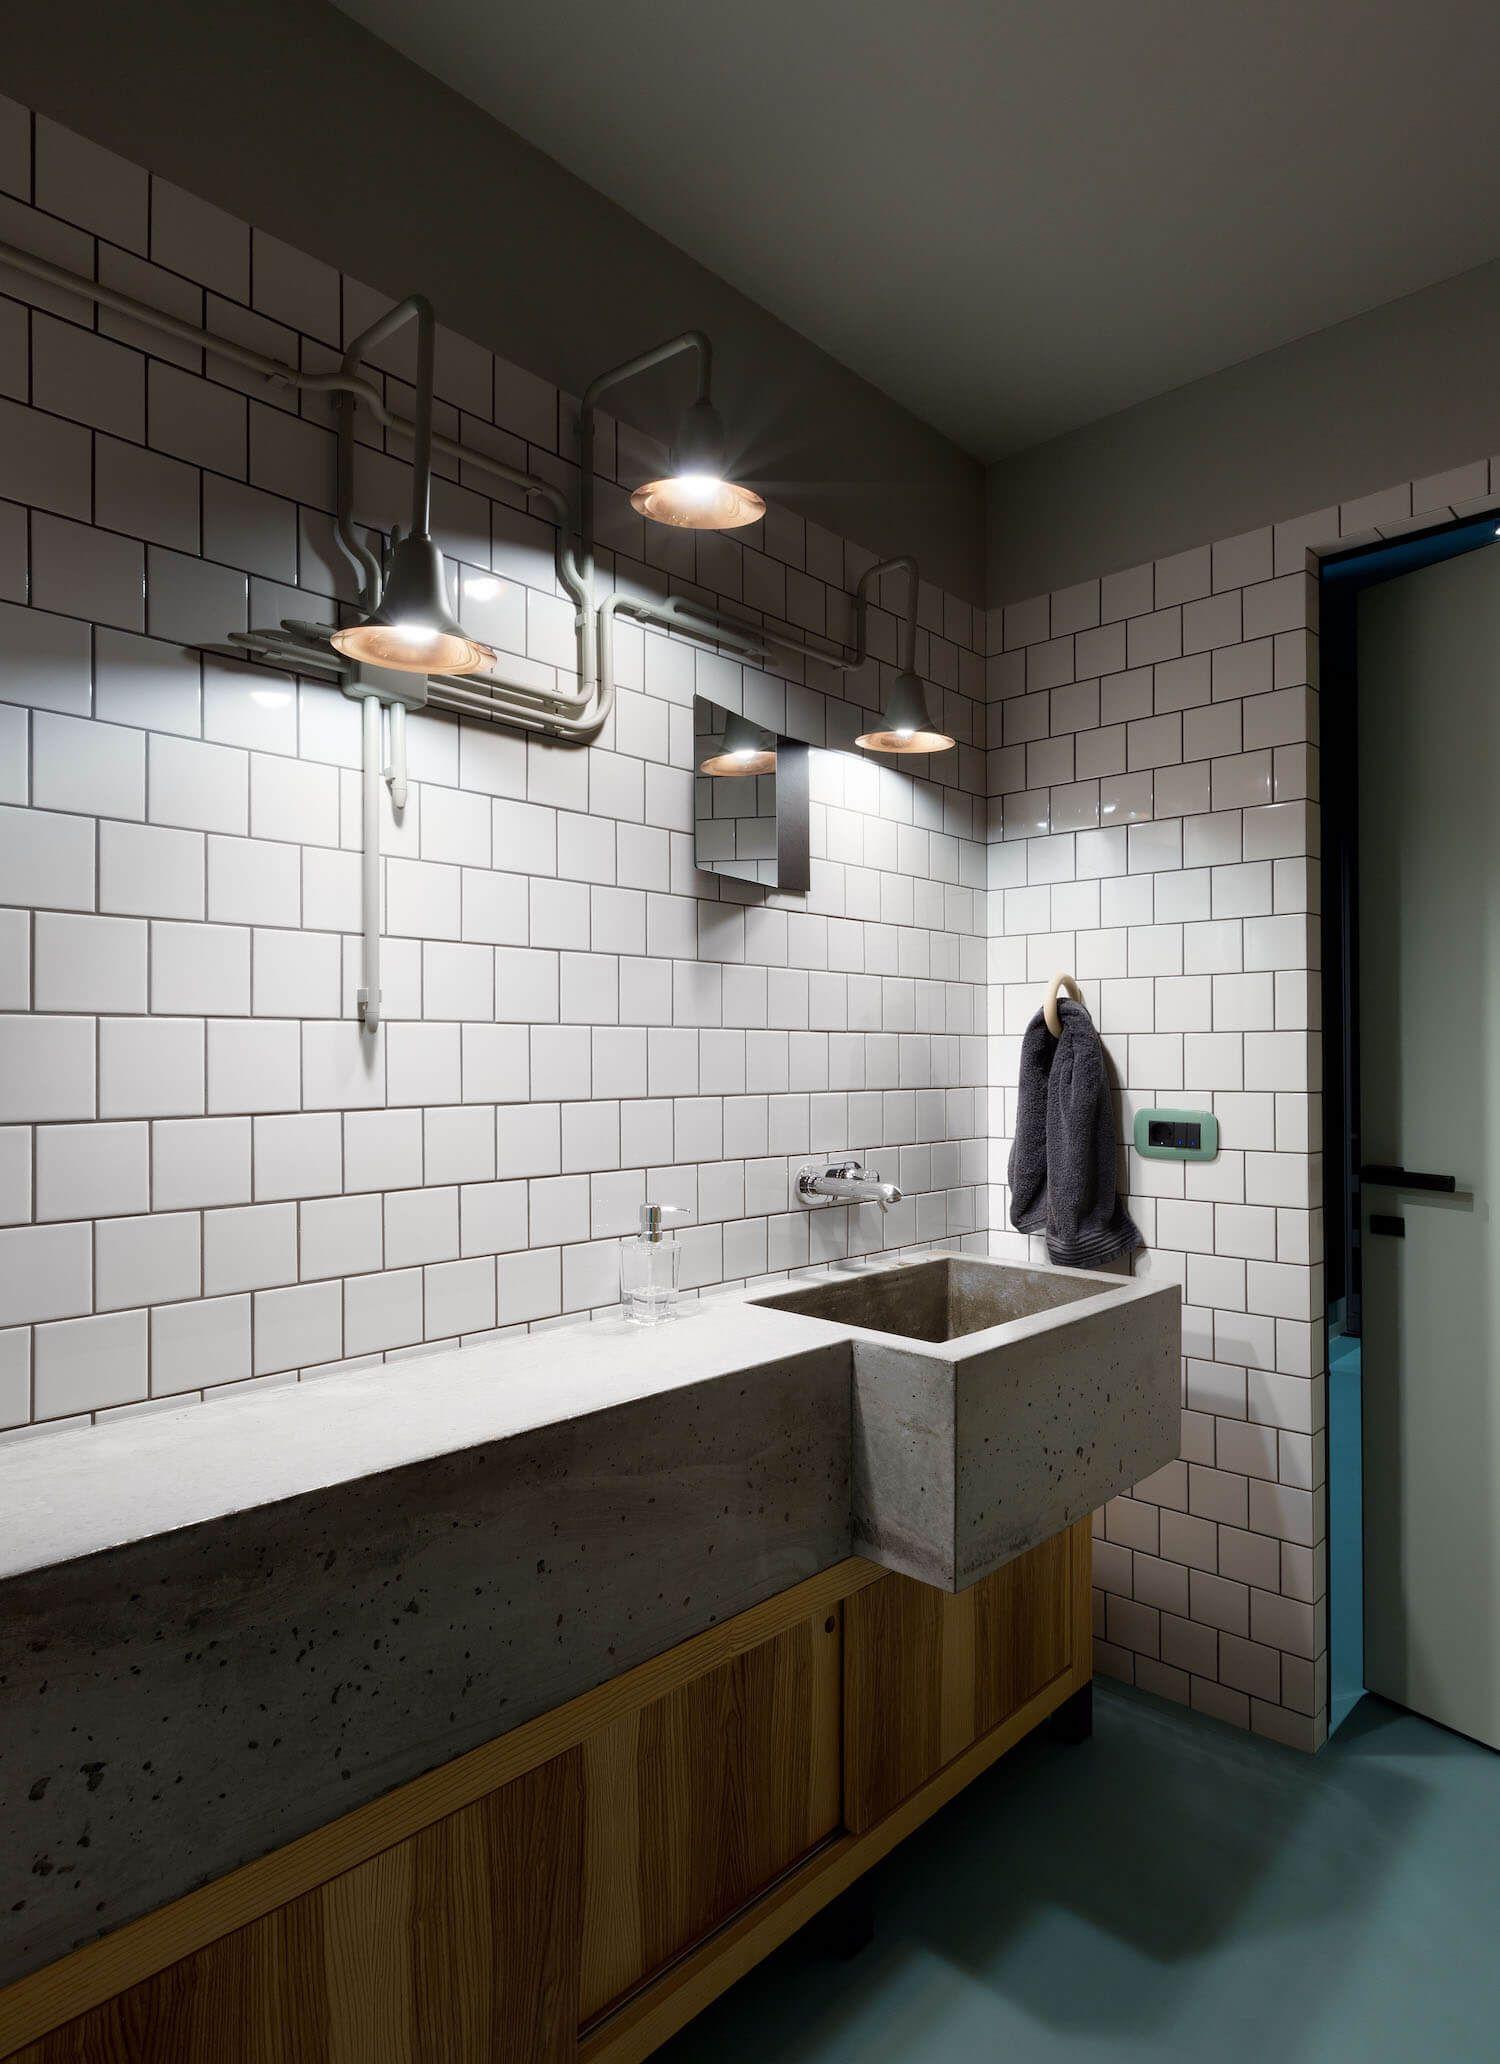 bathroom the green apartment by special project venediktov est living green apartmentapartment designkitchen interiorsubway tilespowder